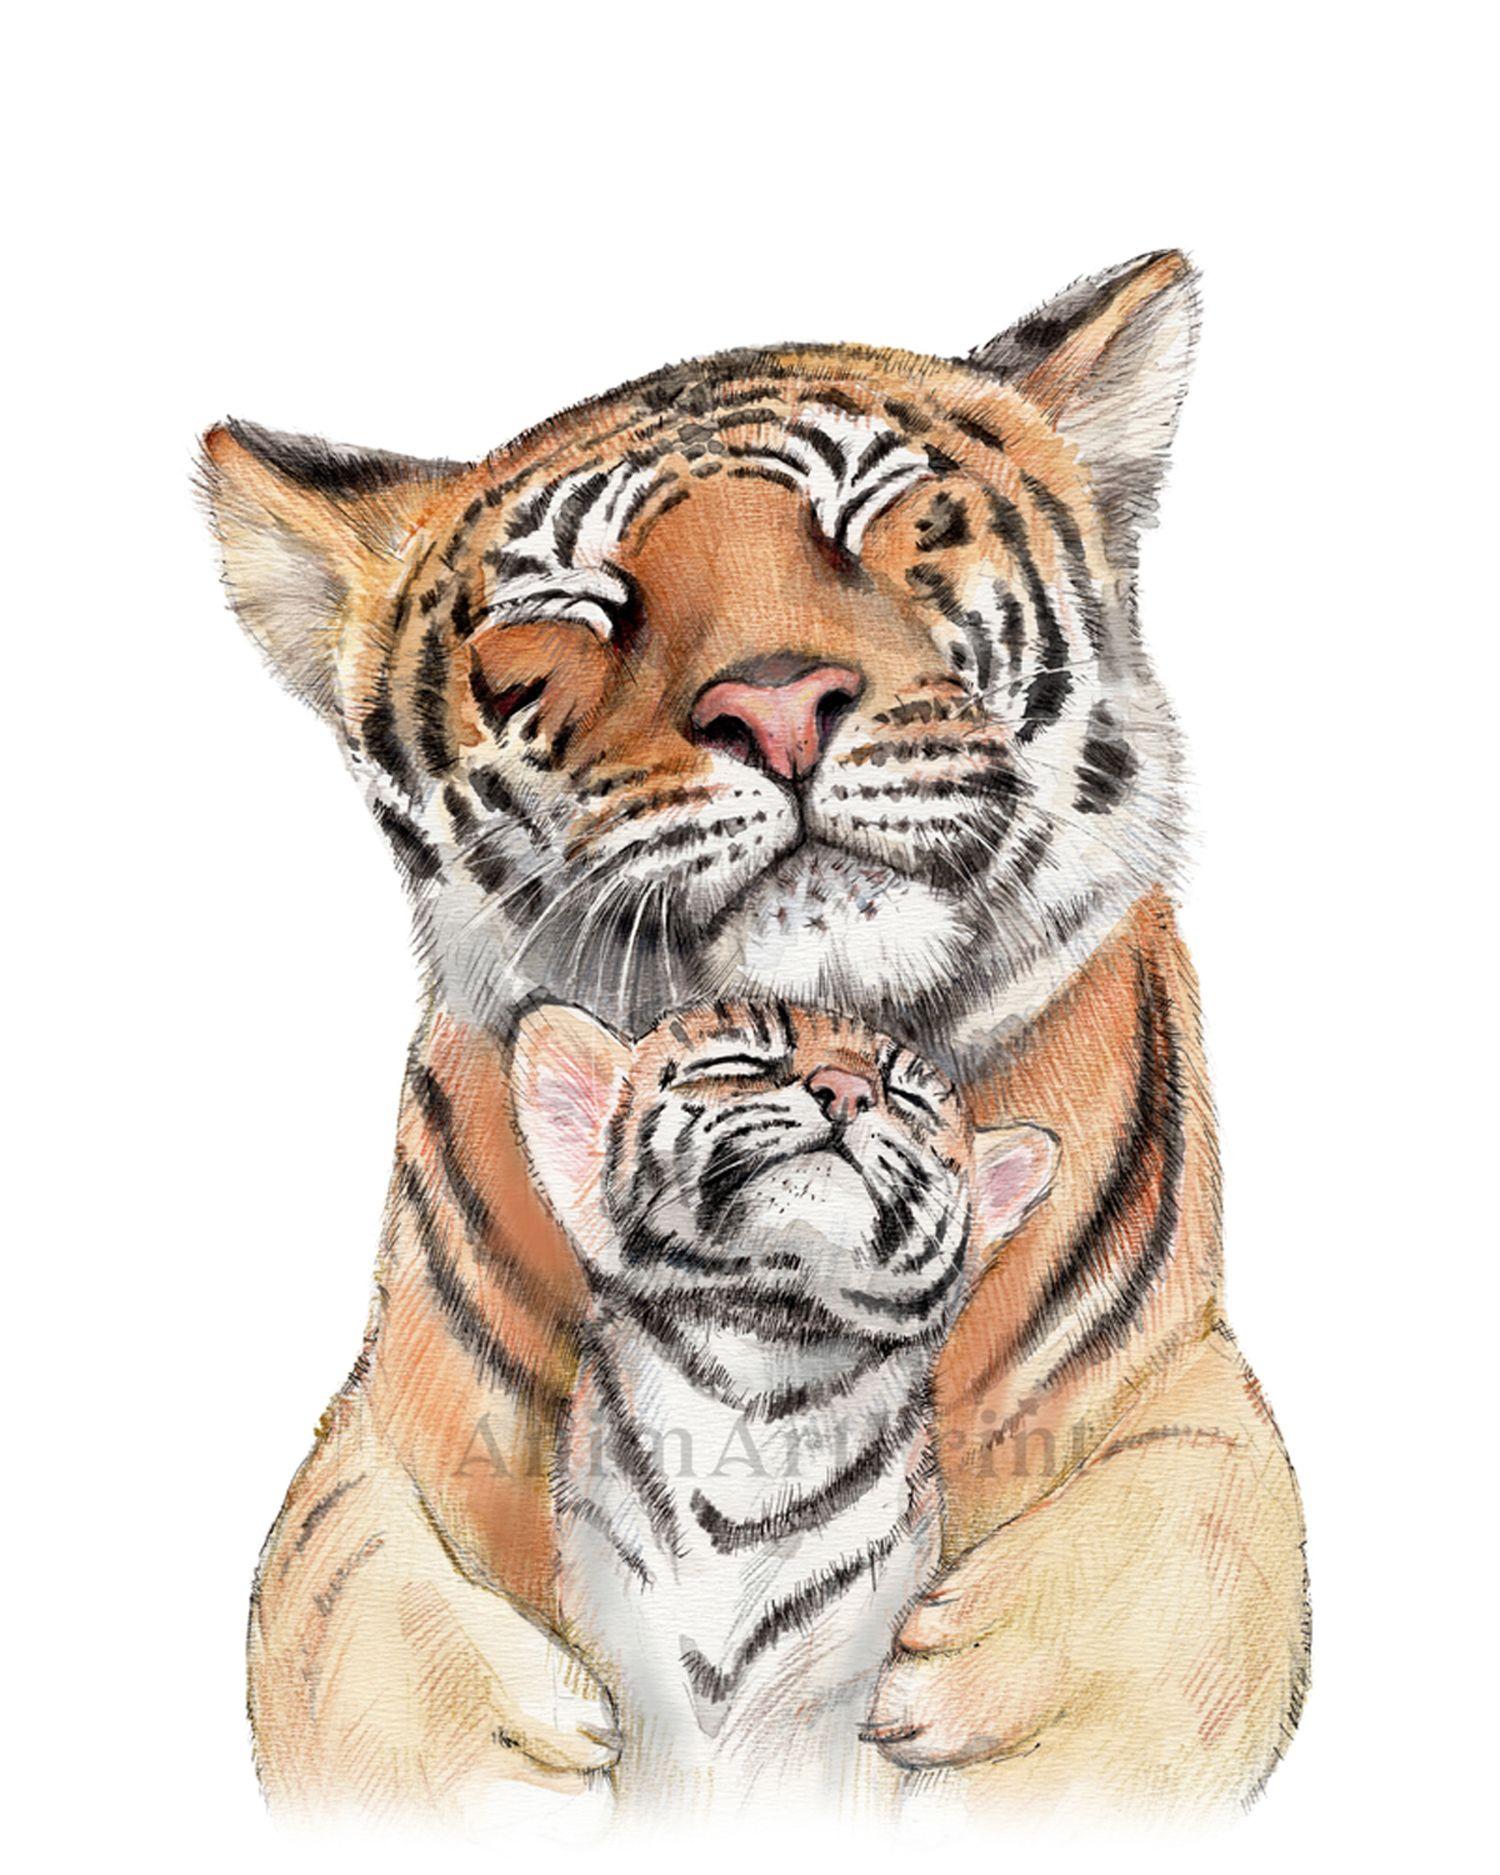 Tiger Mom And Baby Animal Print Painting For Nursery